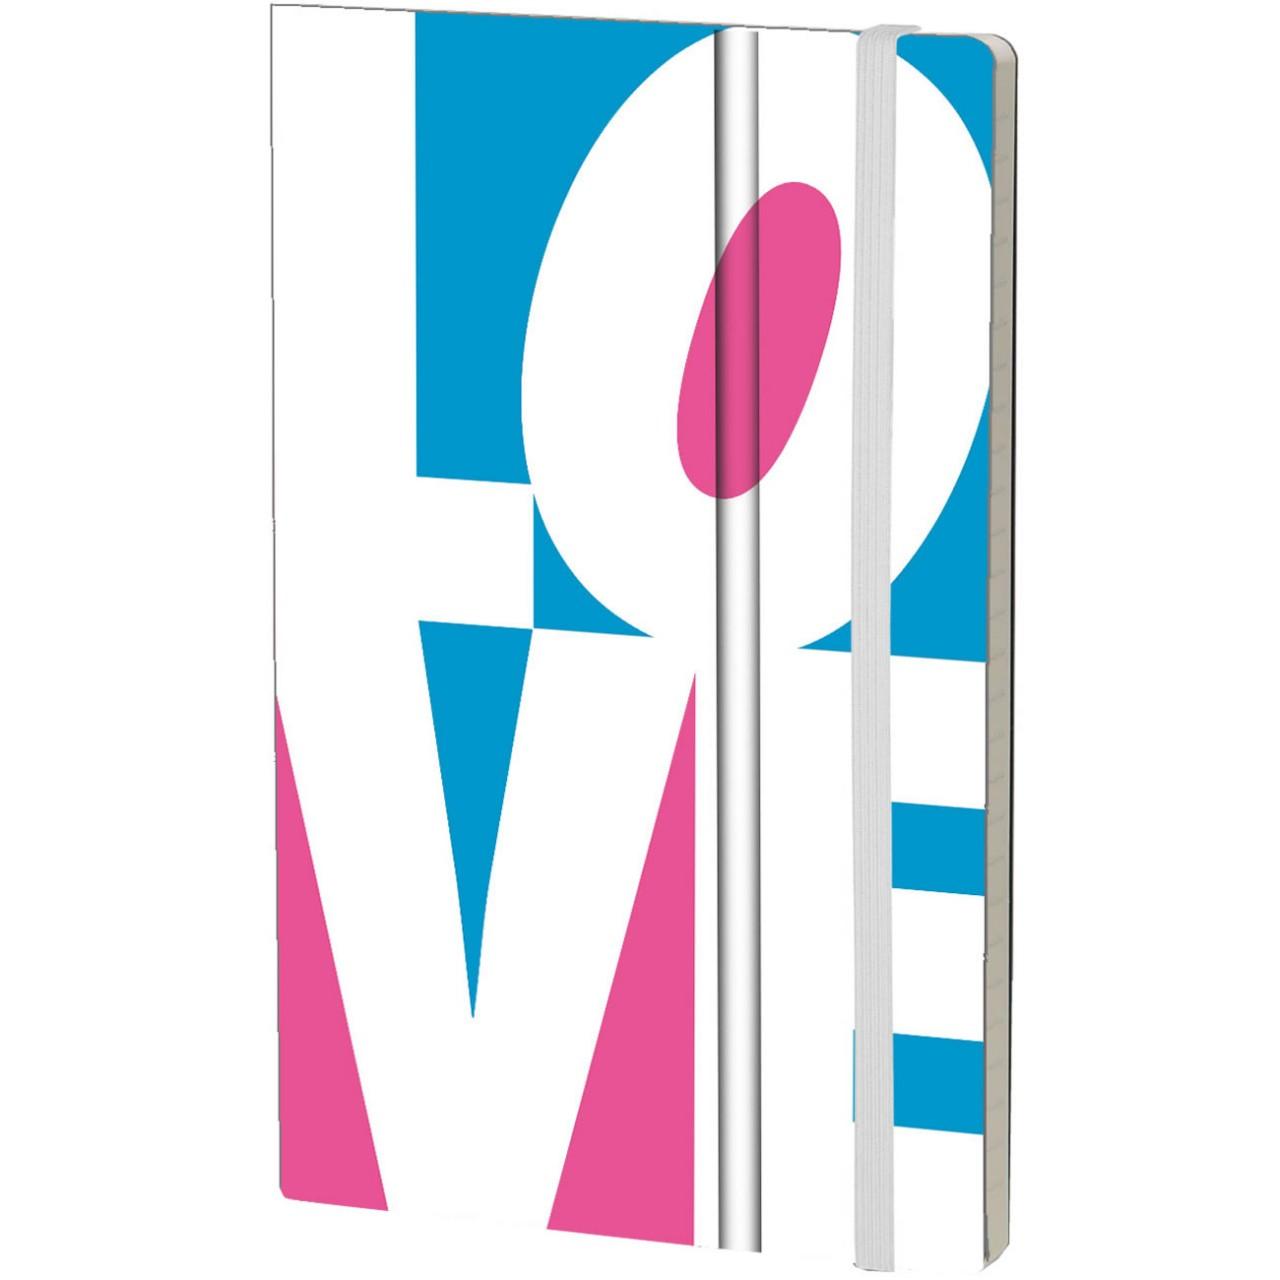 Stifflexible Notizbuch FLUO LOVE 13 x 21 cm 192 S., WHITE